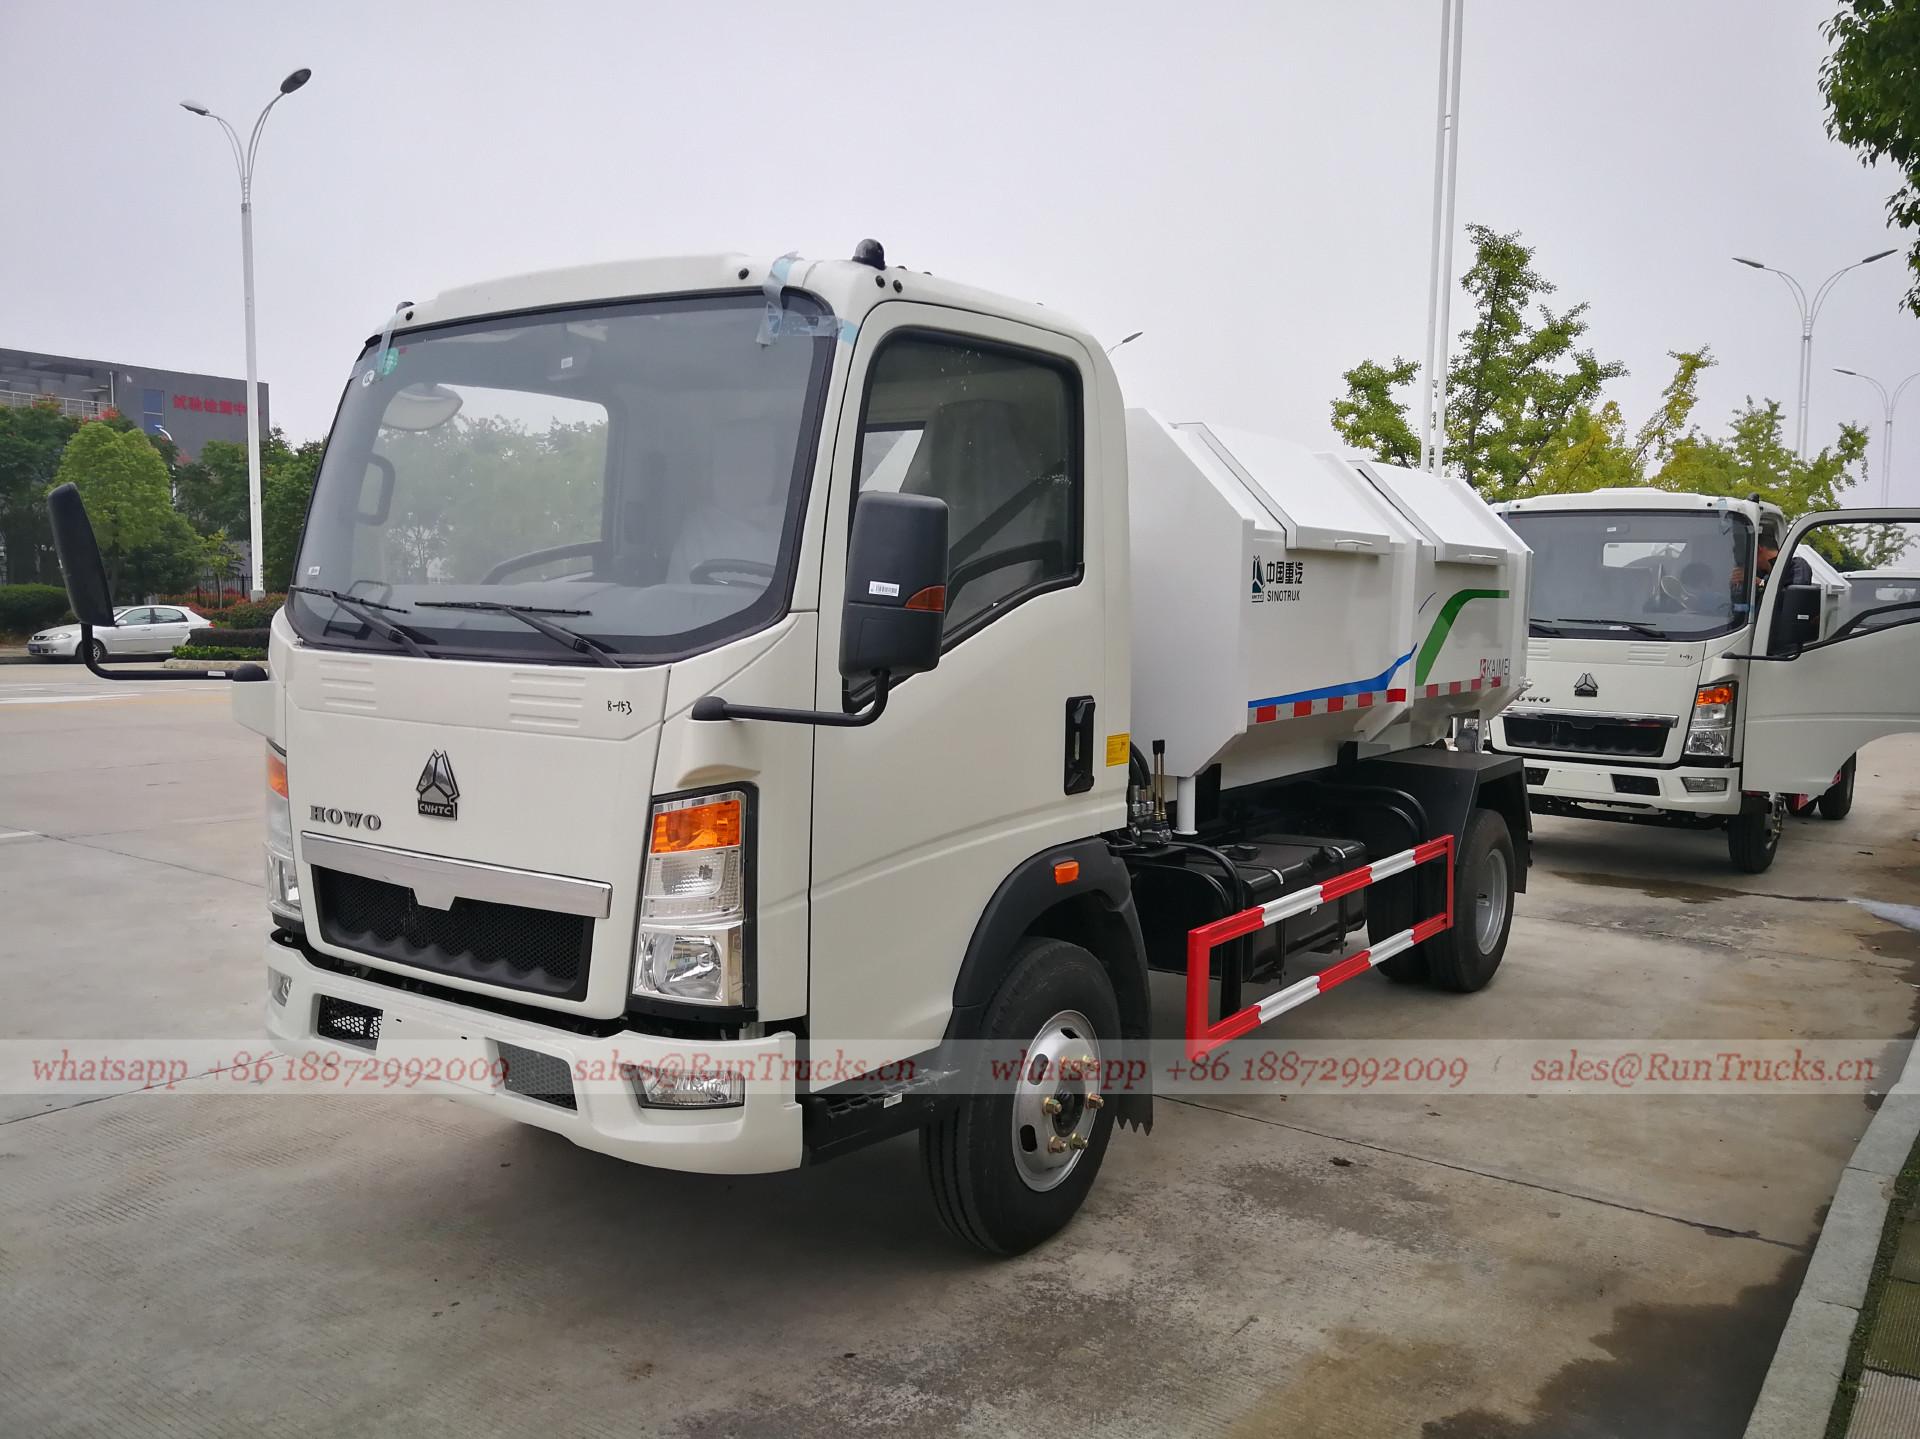 China Sinotruk Abfall / Müllsammlung Müllwagen